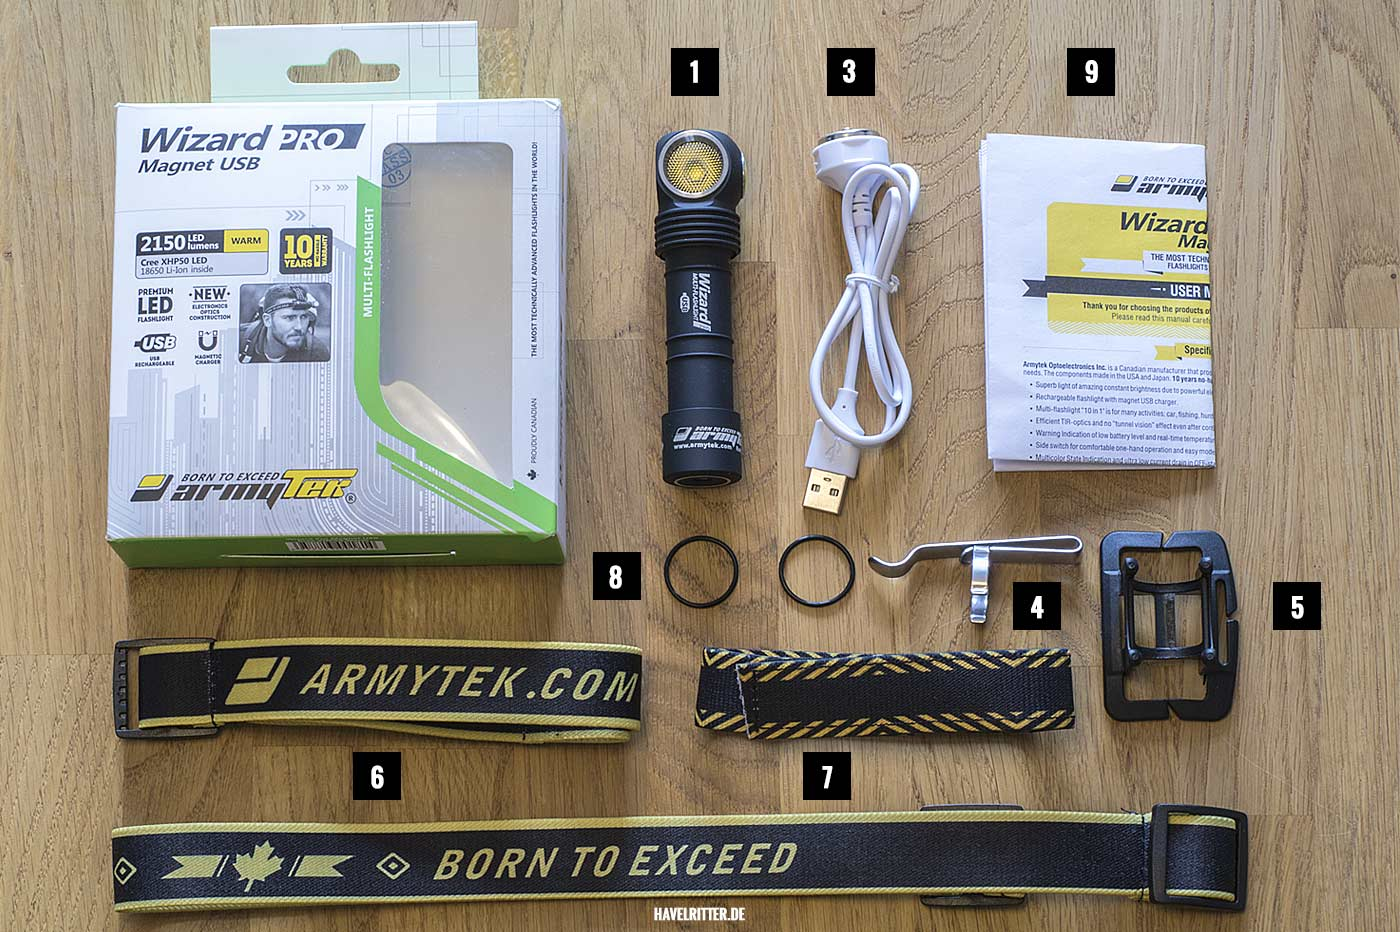 Armytek Wizard Pro Magnet USB - Lieferumfang